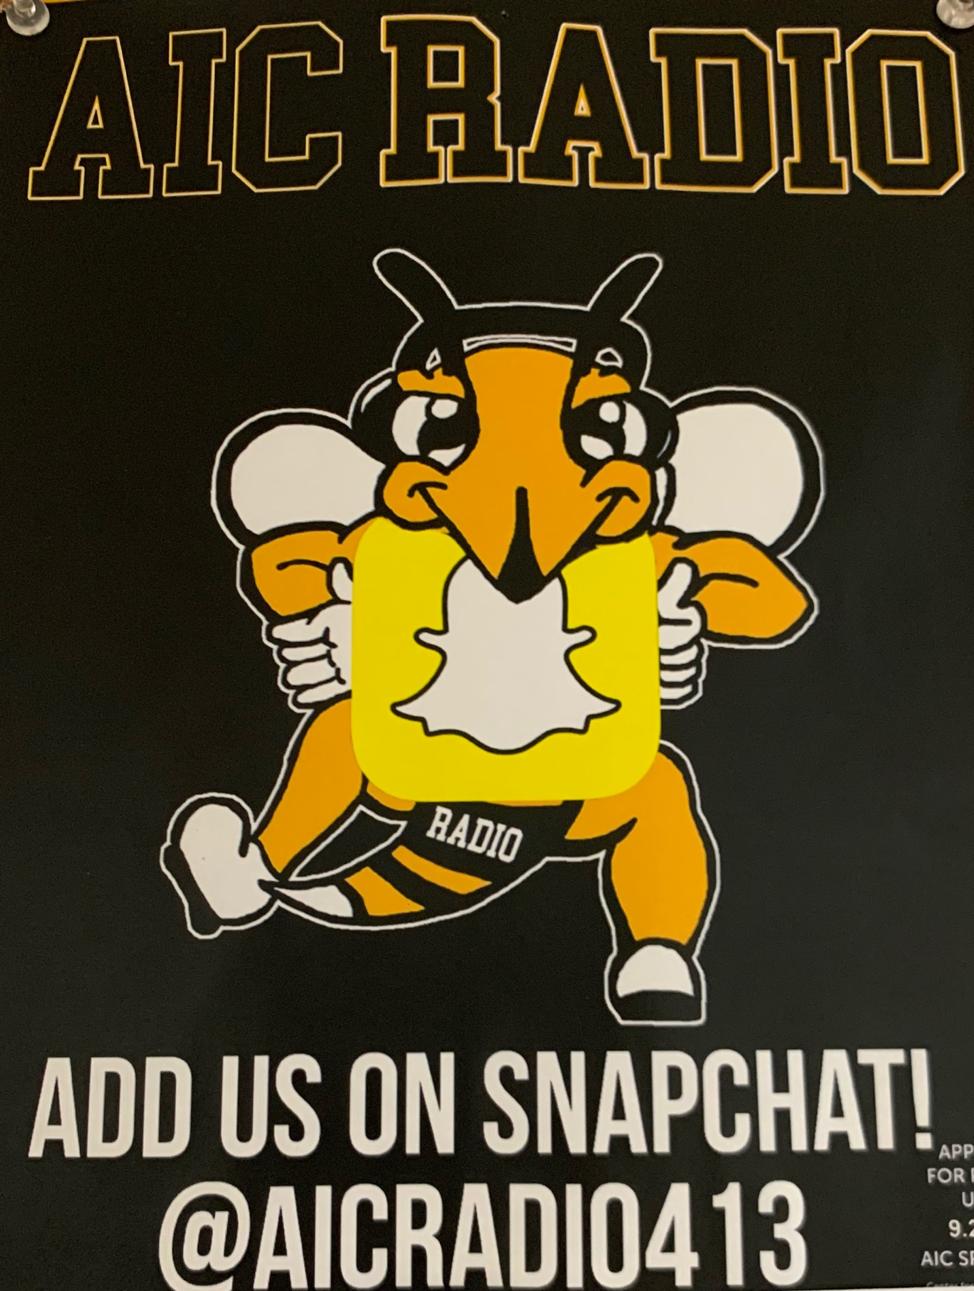 Follow the Radio Club @aicradio413 on Snapchat